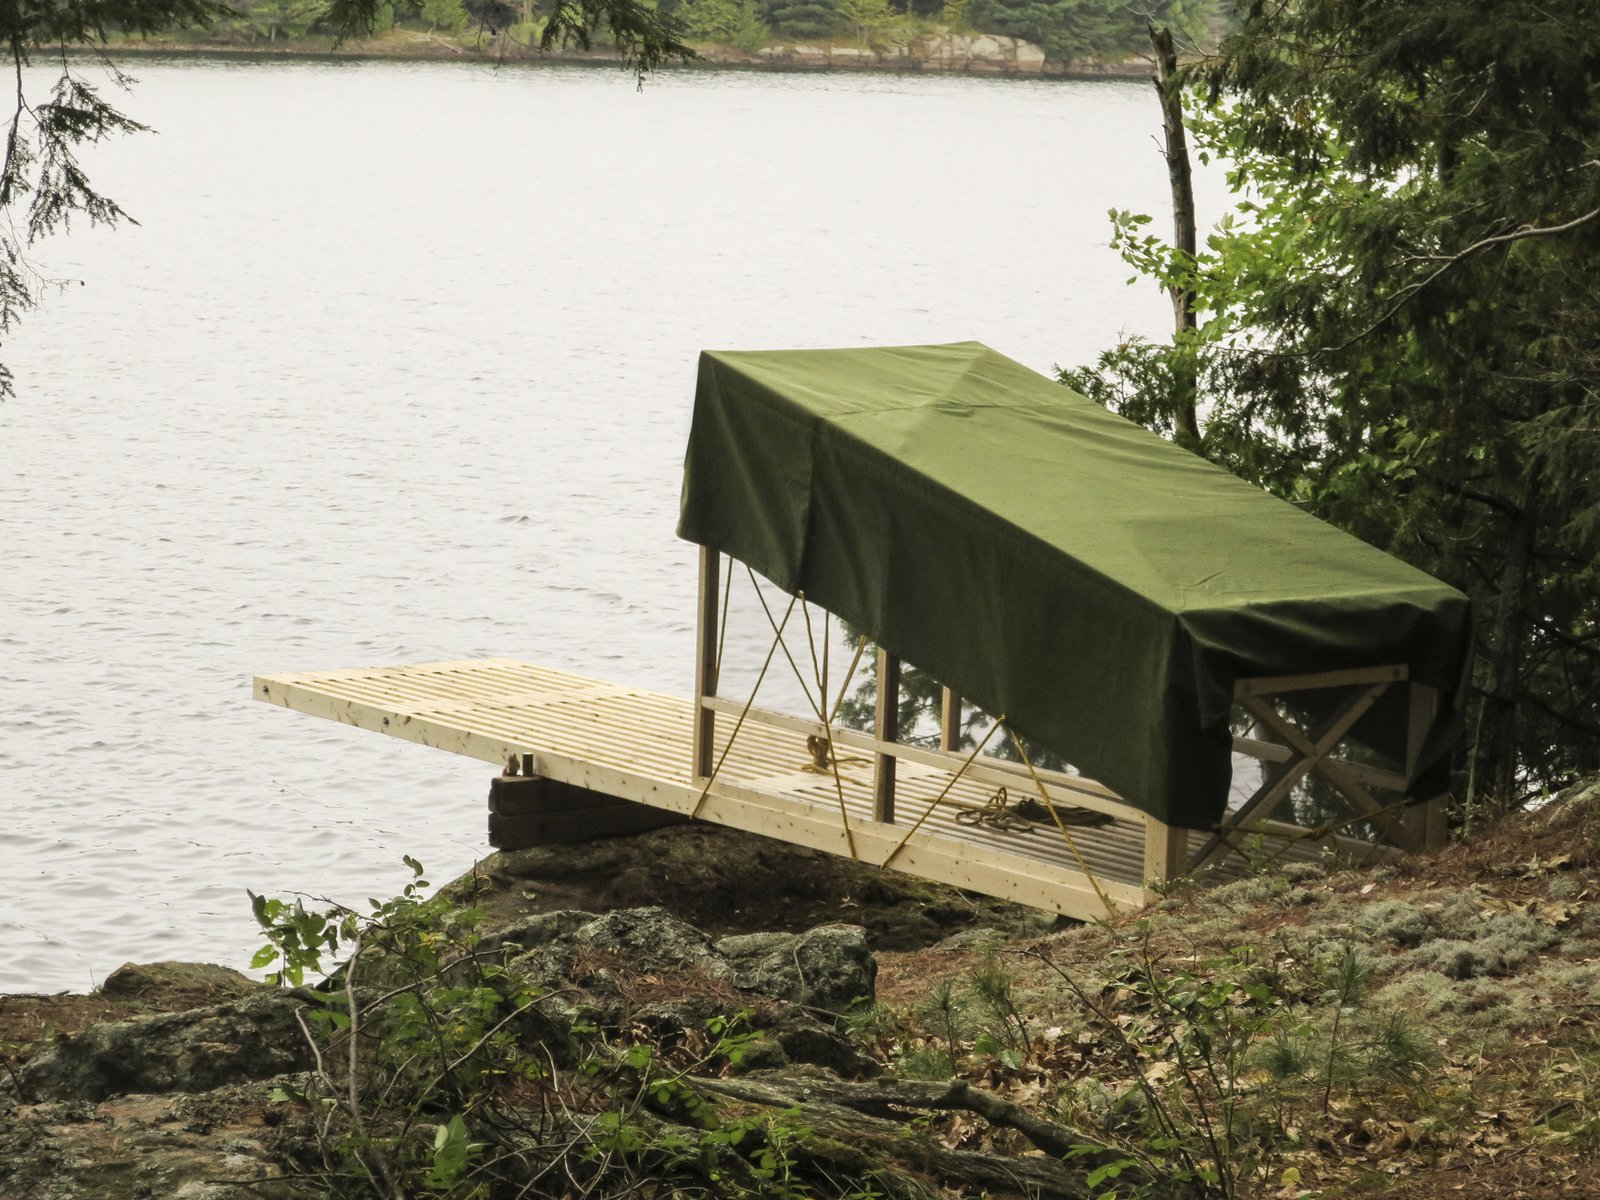 Photo 3 of 6 in Dream/Dive Platform Encourages Playful Summer Living